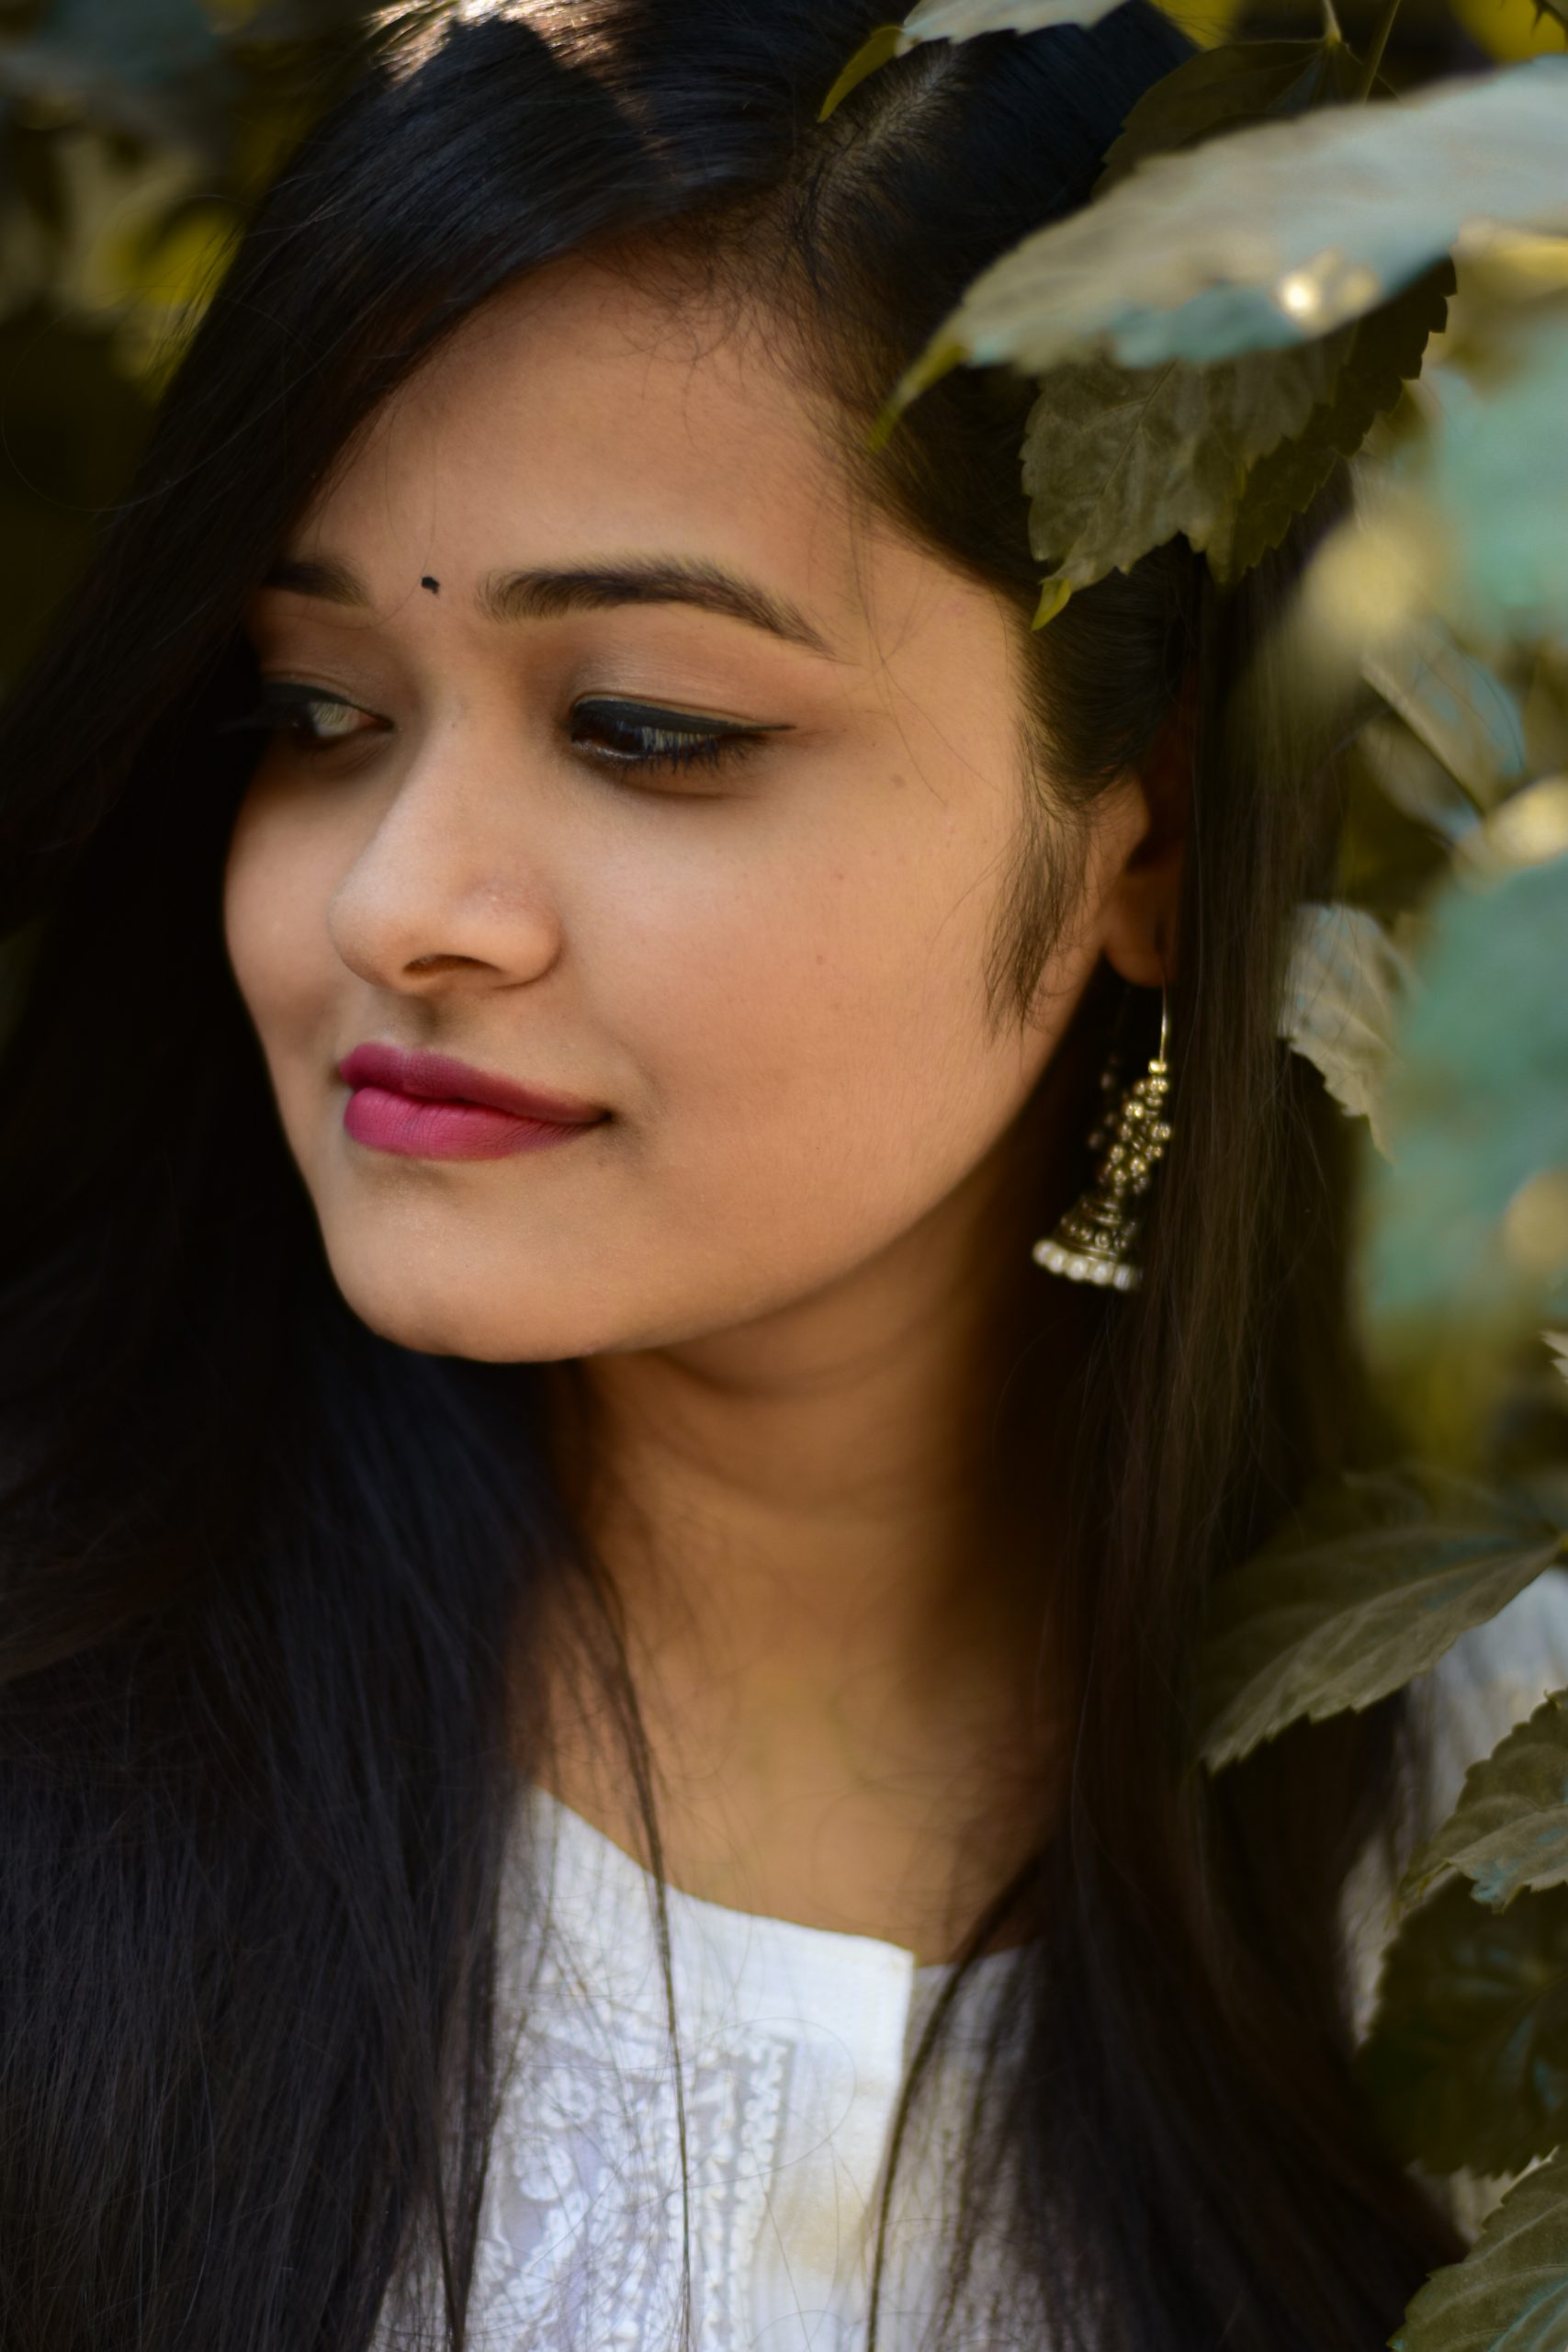 Close-up Shoot of a Girl Face